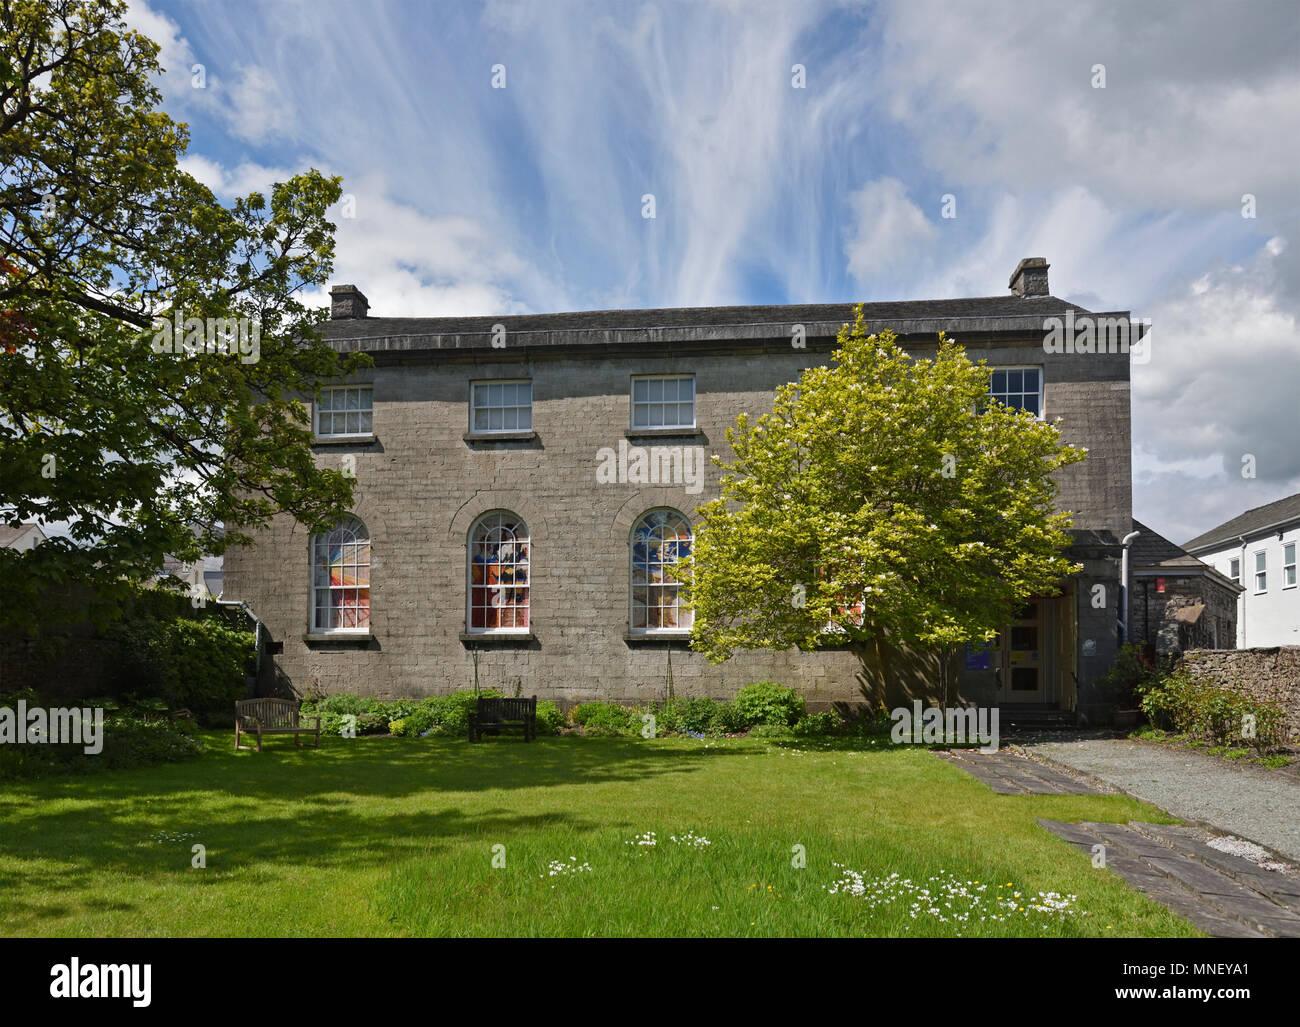 Friends Meeting House. Stramongate, Kendal, Cumbria, England, United Kingdom, Europe. - Stock Image